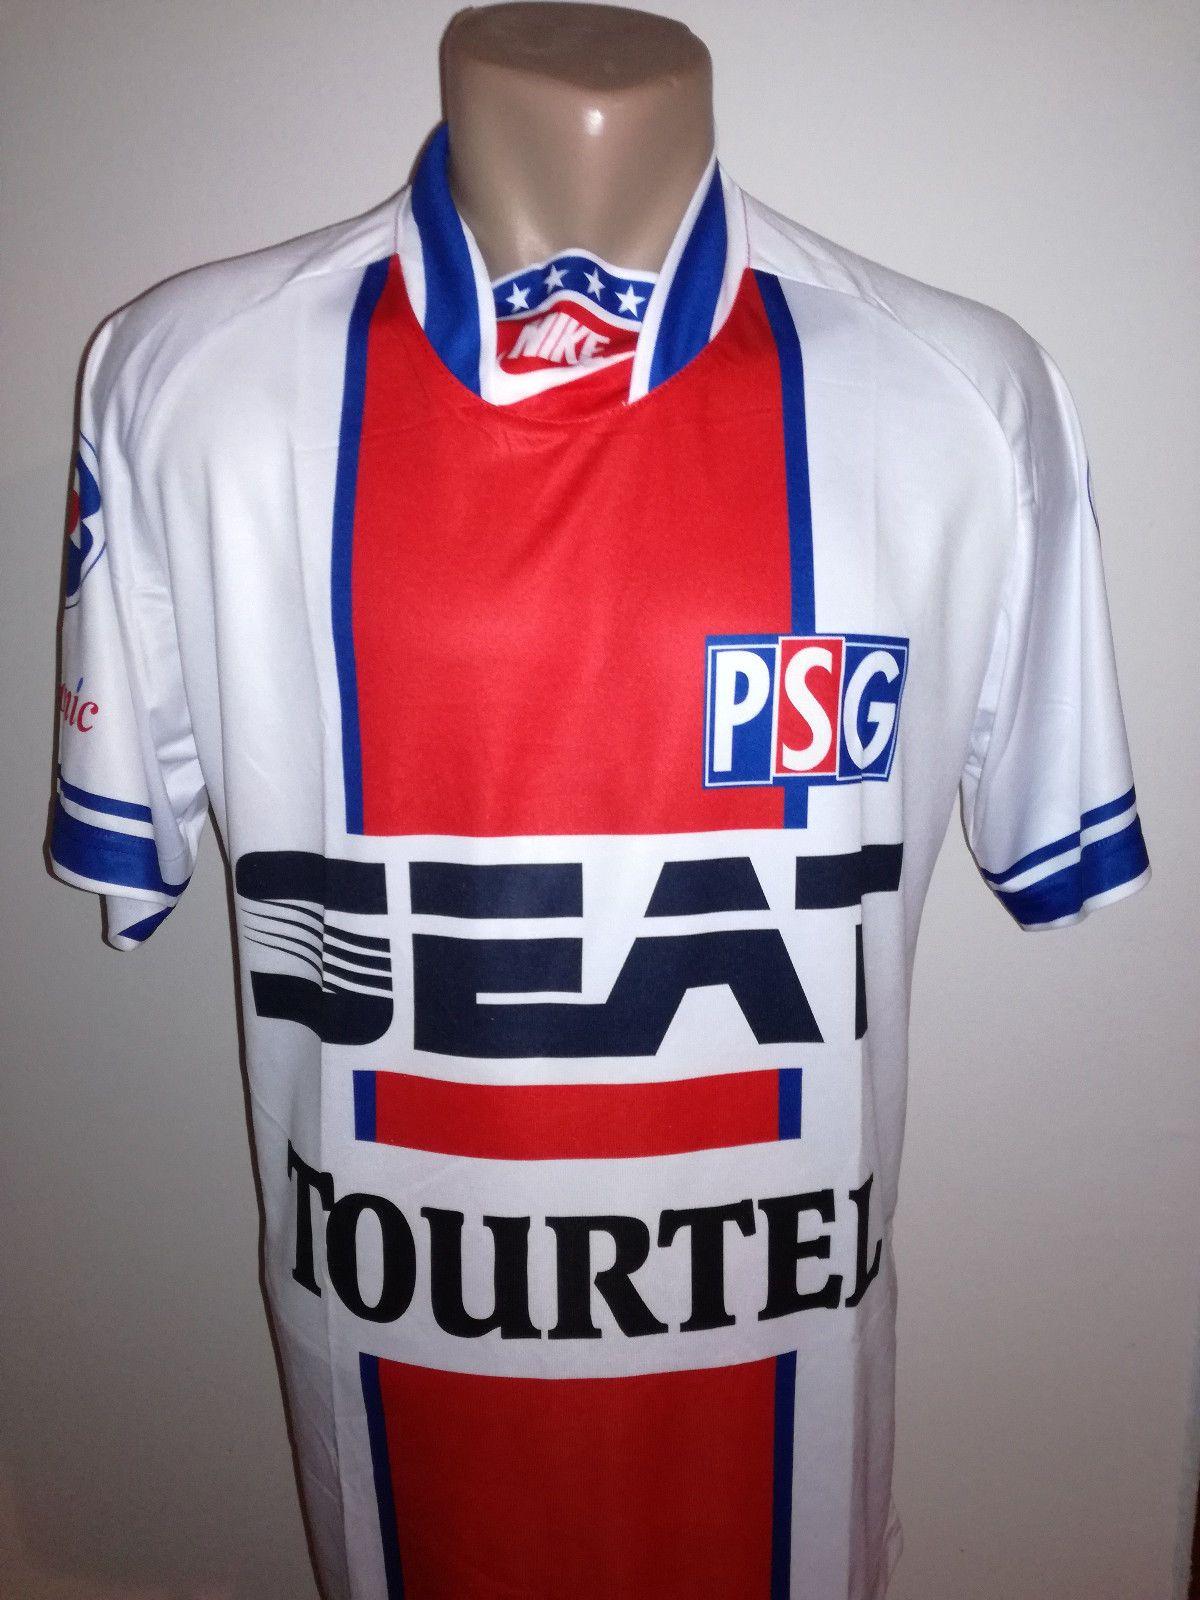 7f07140e6 Details about PSG Retro Football Jersey France Soccer Shirt WEAH Camiseta  Mailot Maglia Paris